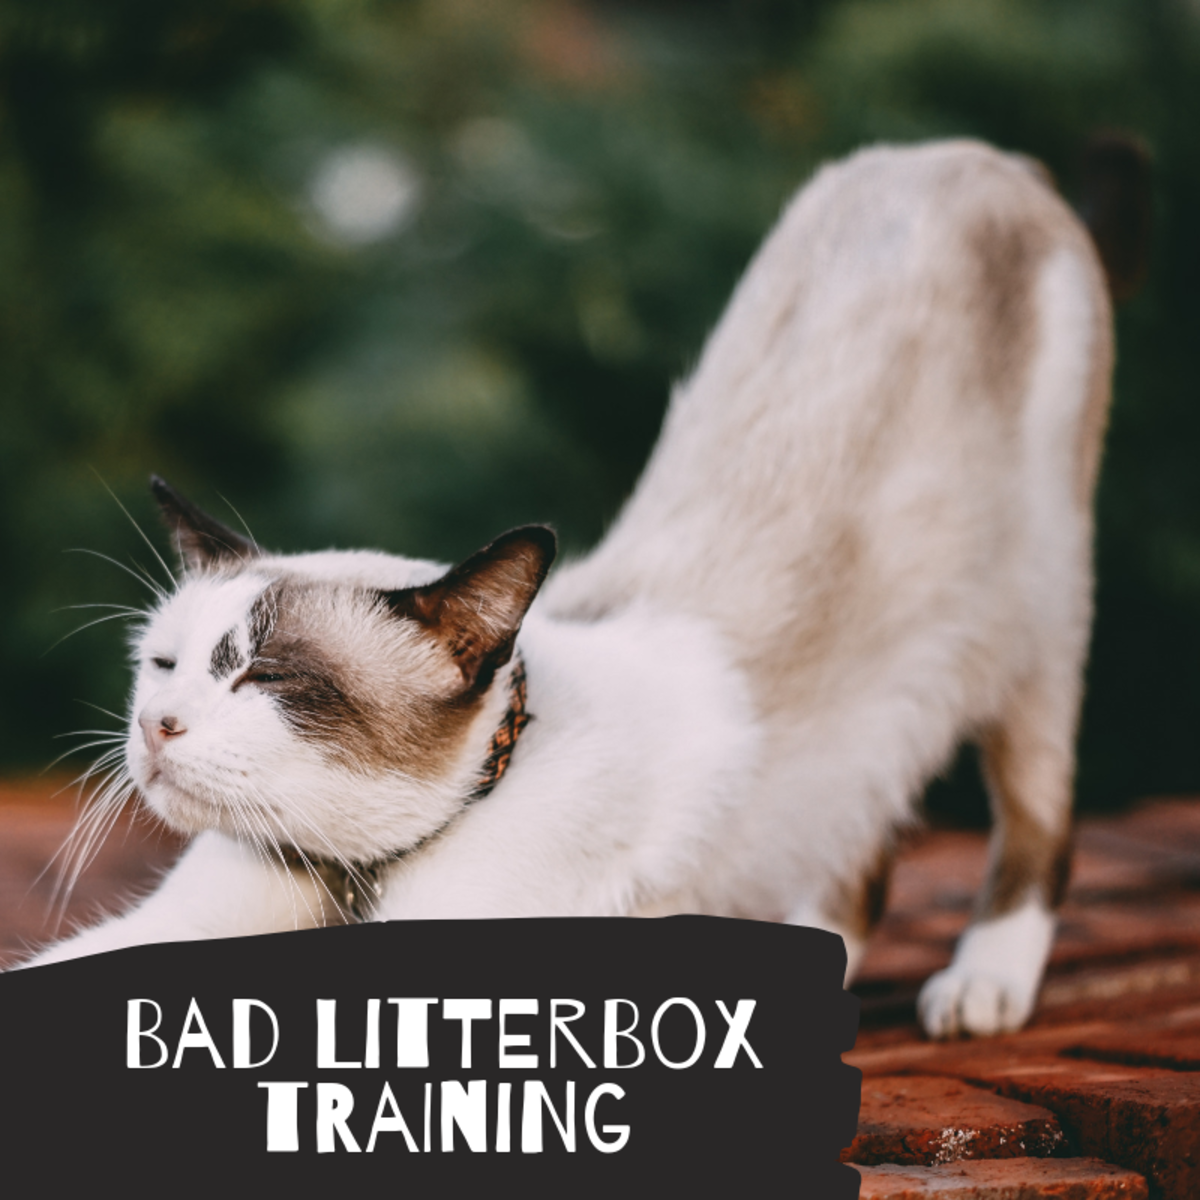 Bad Litterbox Training